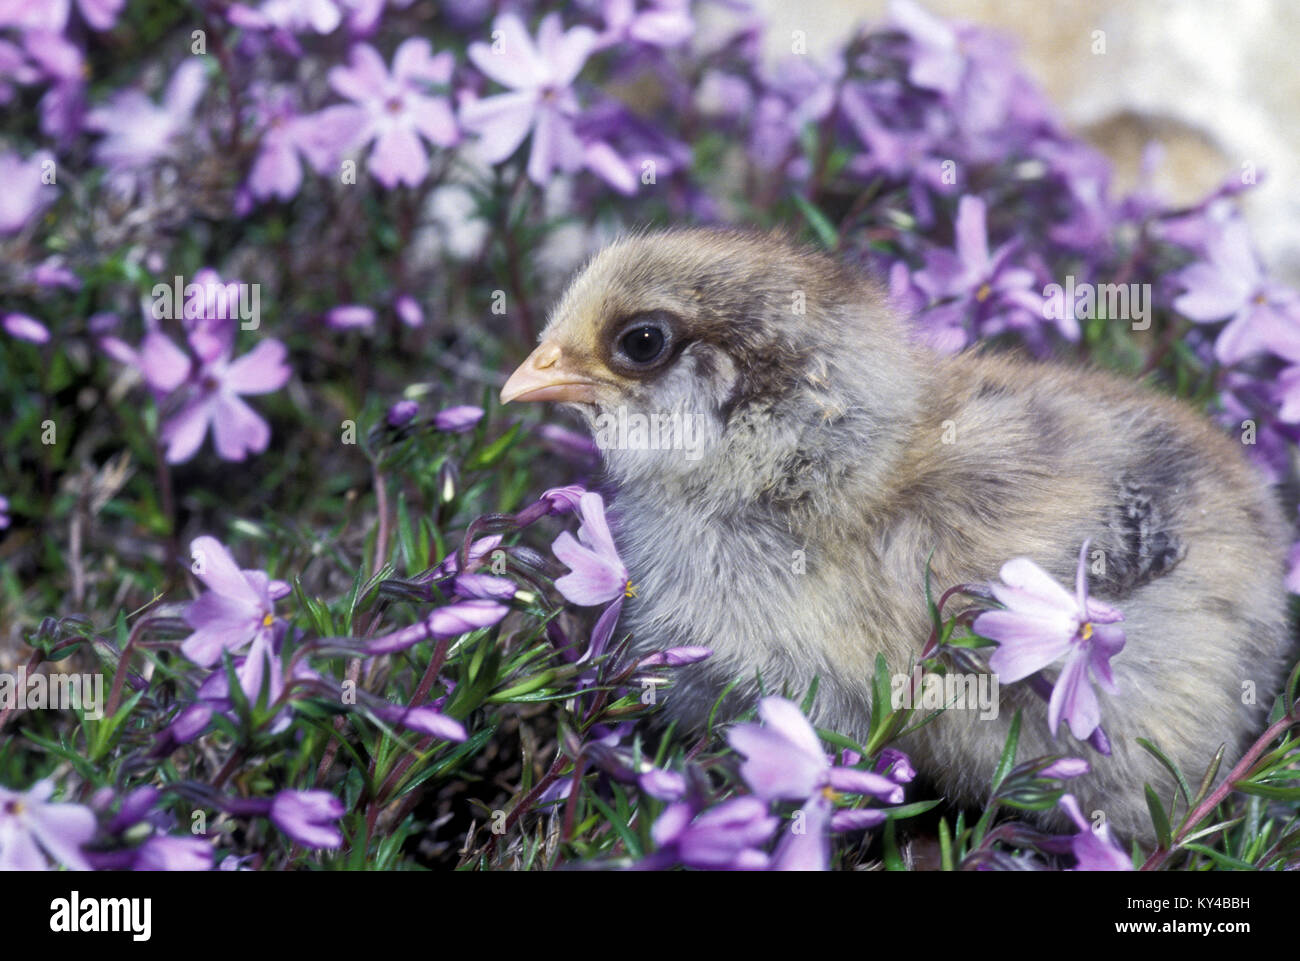 Adorable gray chick (Gallus gallus) in lavender phlox (Phlox stolonifera) in springtime, Missouri, USA. - Stock Image